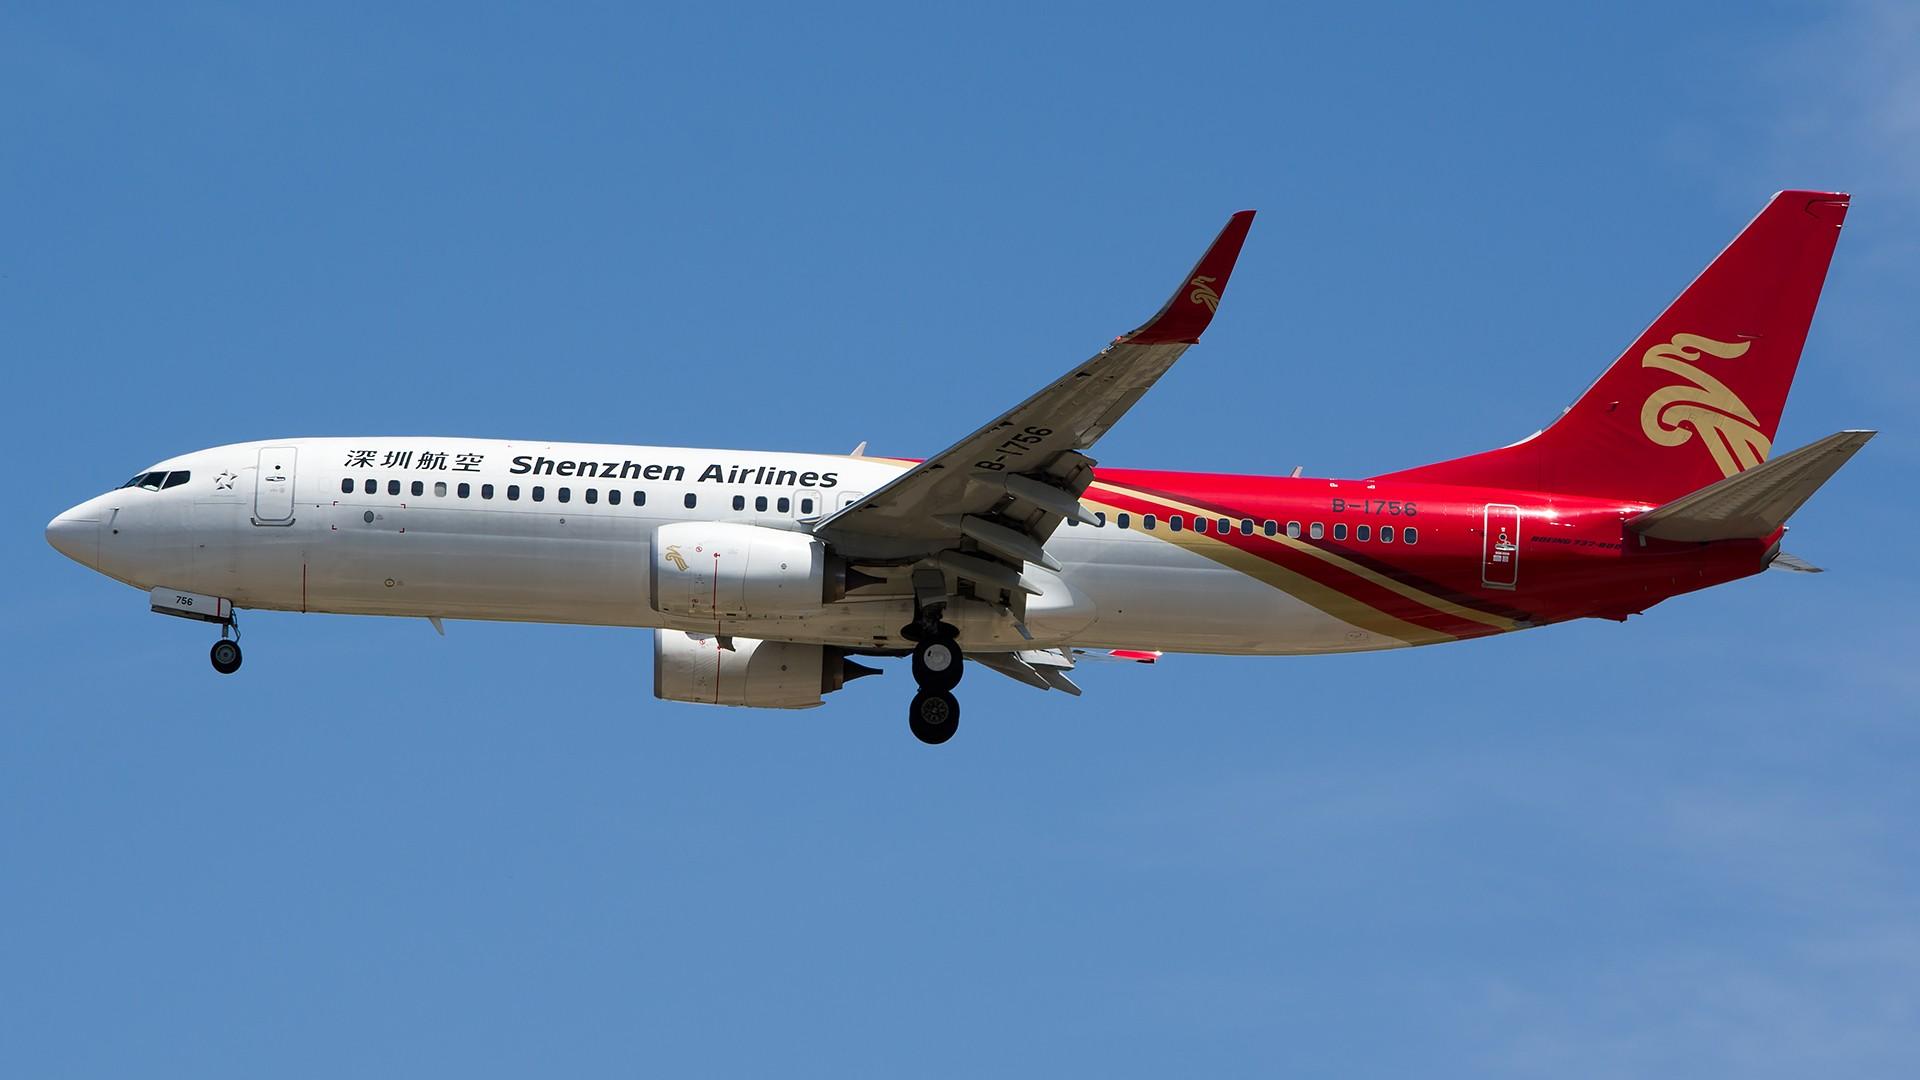 Re:[原创]PEK01午后两小时抓拍,其实是为AA的One World来的 BOEING 737-800 B-1756 中国北京首都国际机场